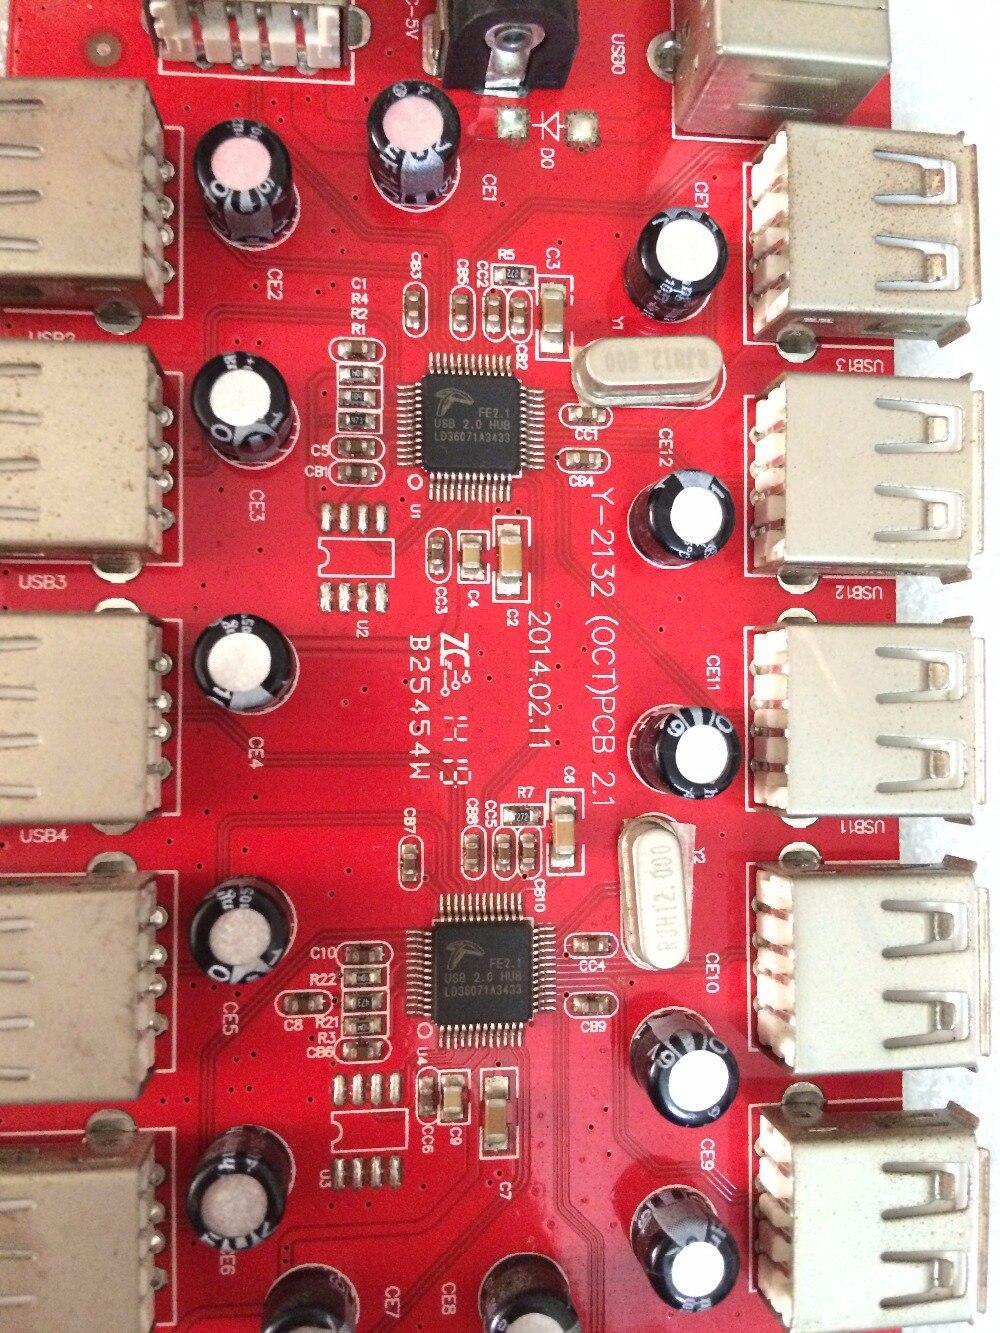 Kvm-switches Kuangcheng Usb2.0 13 Port Hub Hub Port Extender Dekonzentrator Pcb